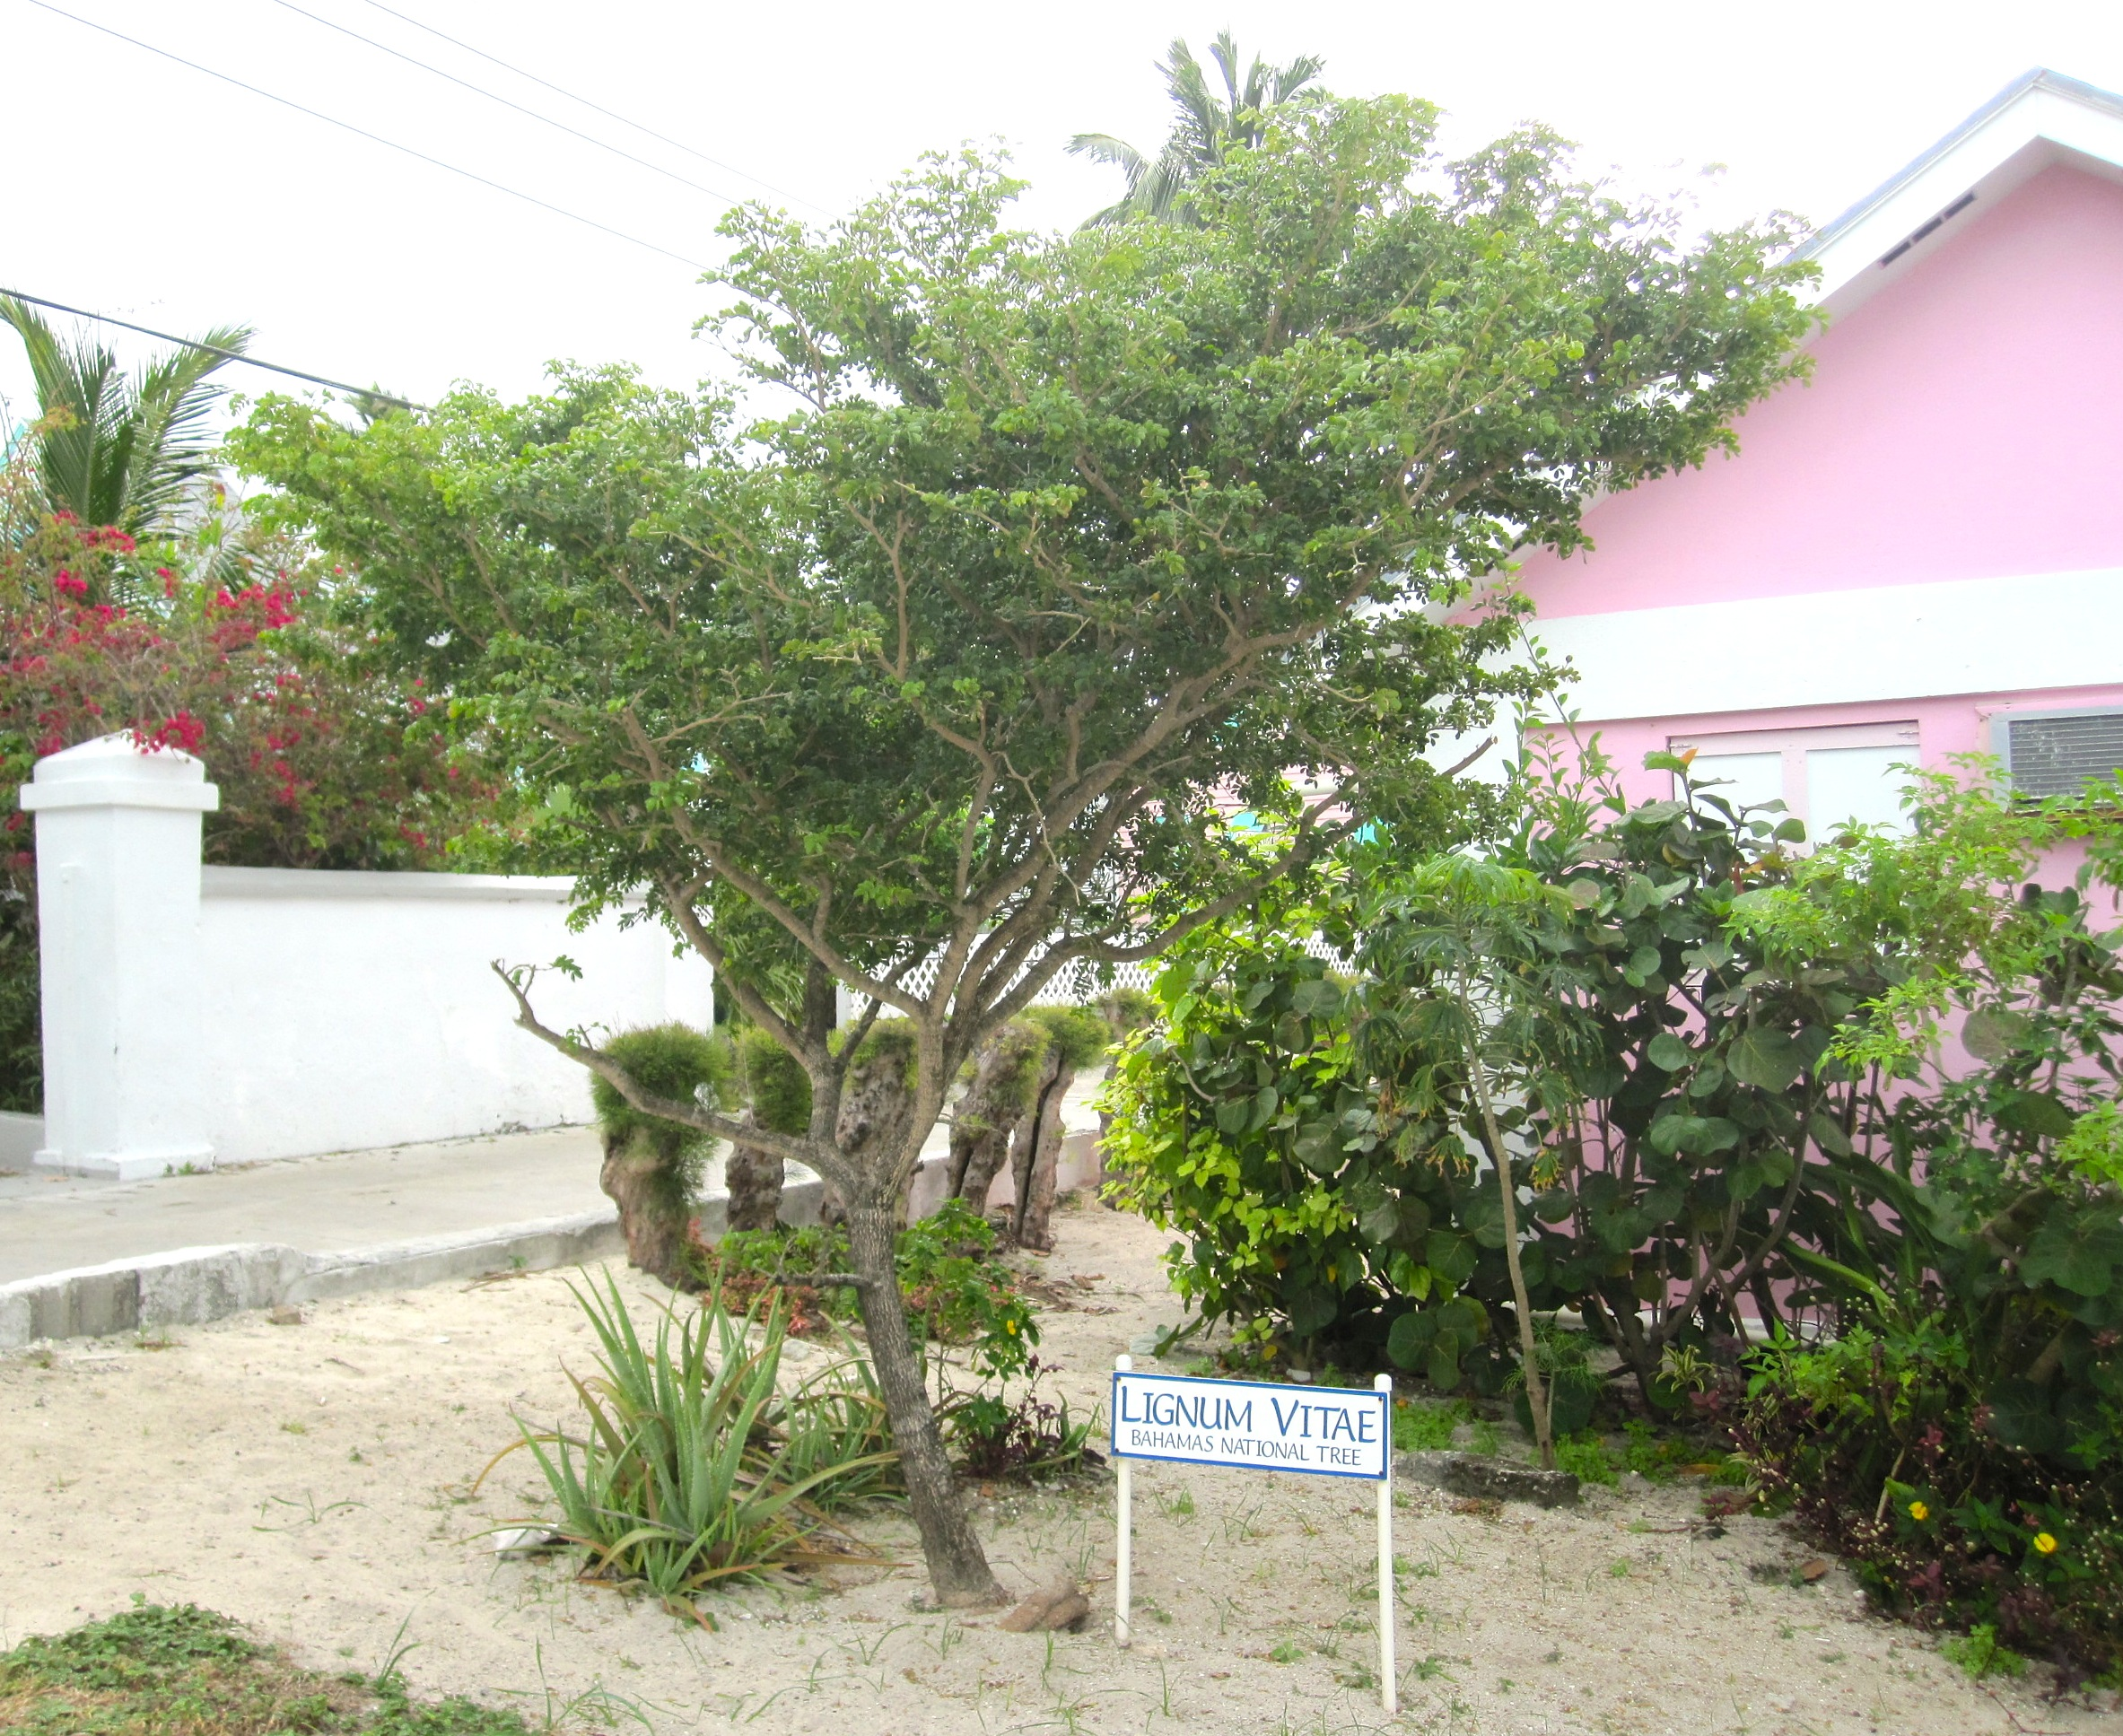 Lignum Vitae Bahamas National Tree